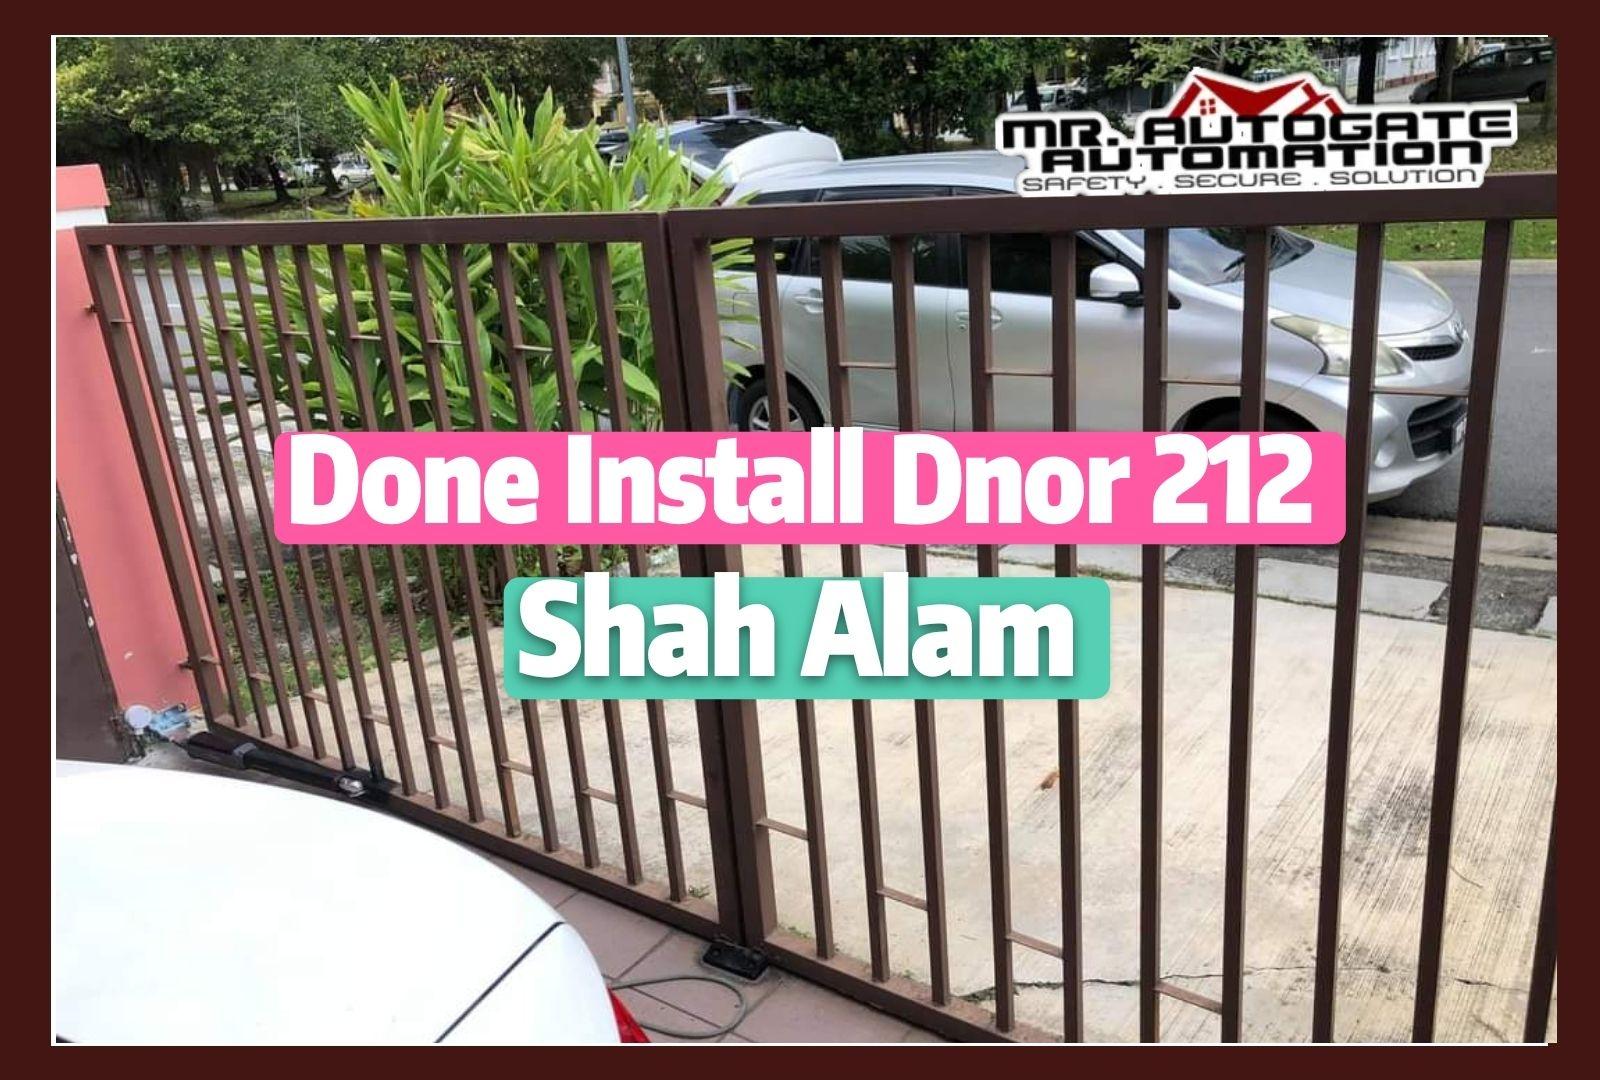 12sep2020 Dnor 212 Shah Alam, Setia Alam, klang, Telok Panglima Garang, Subang Jaya, Puchong